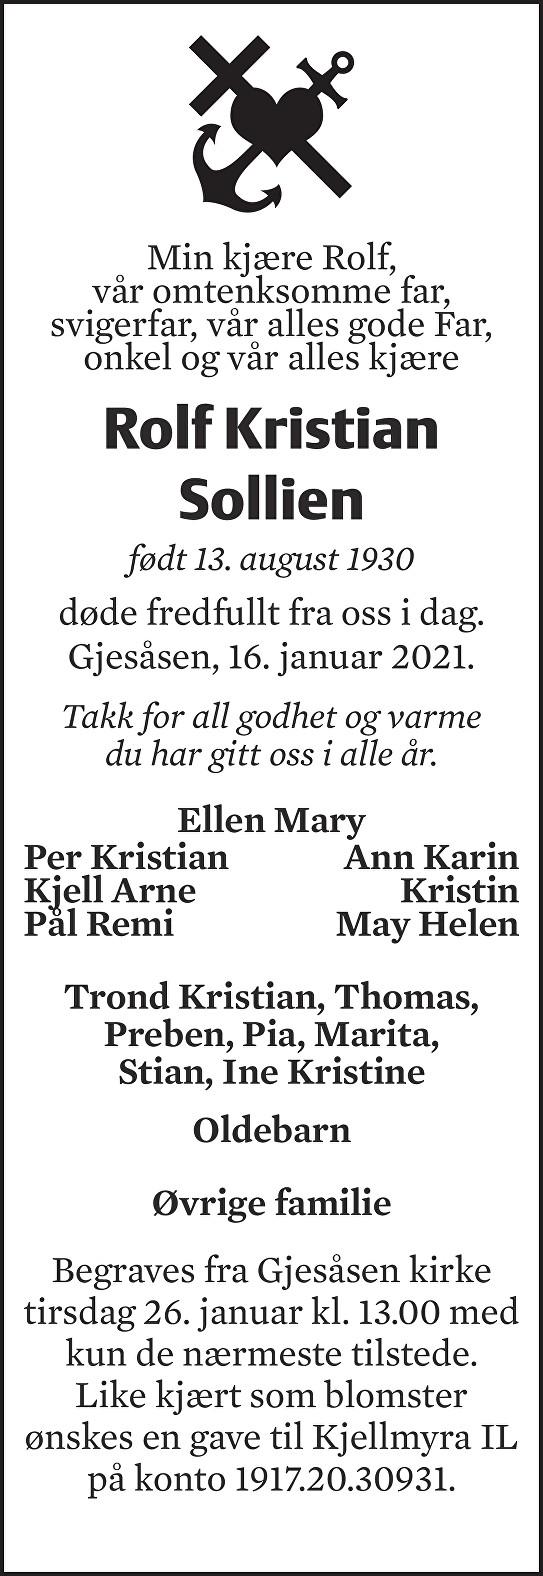 Rolf Kristian Sollien Dødsannonse